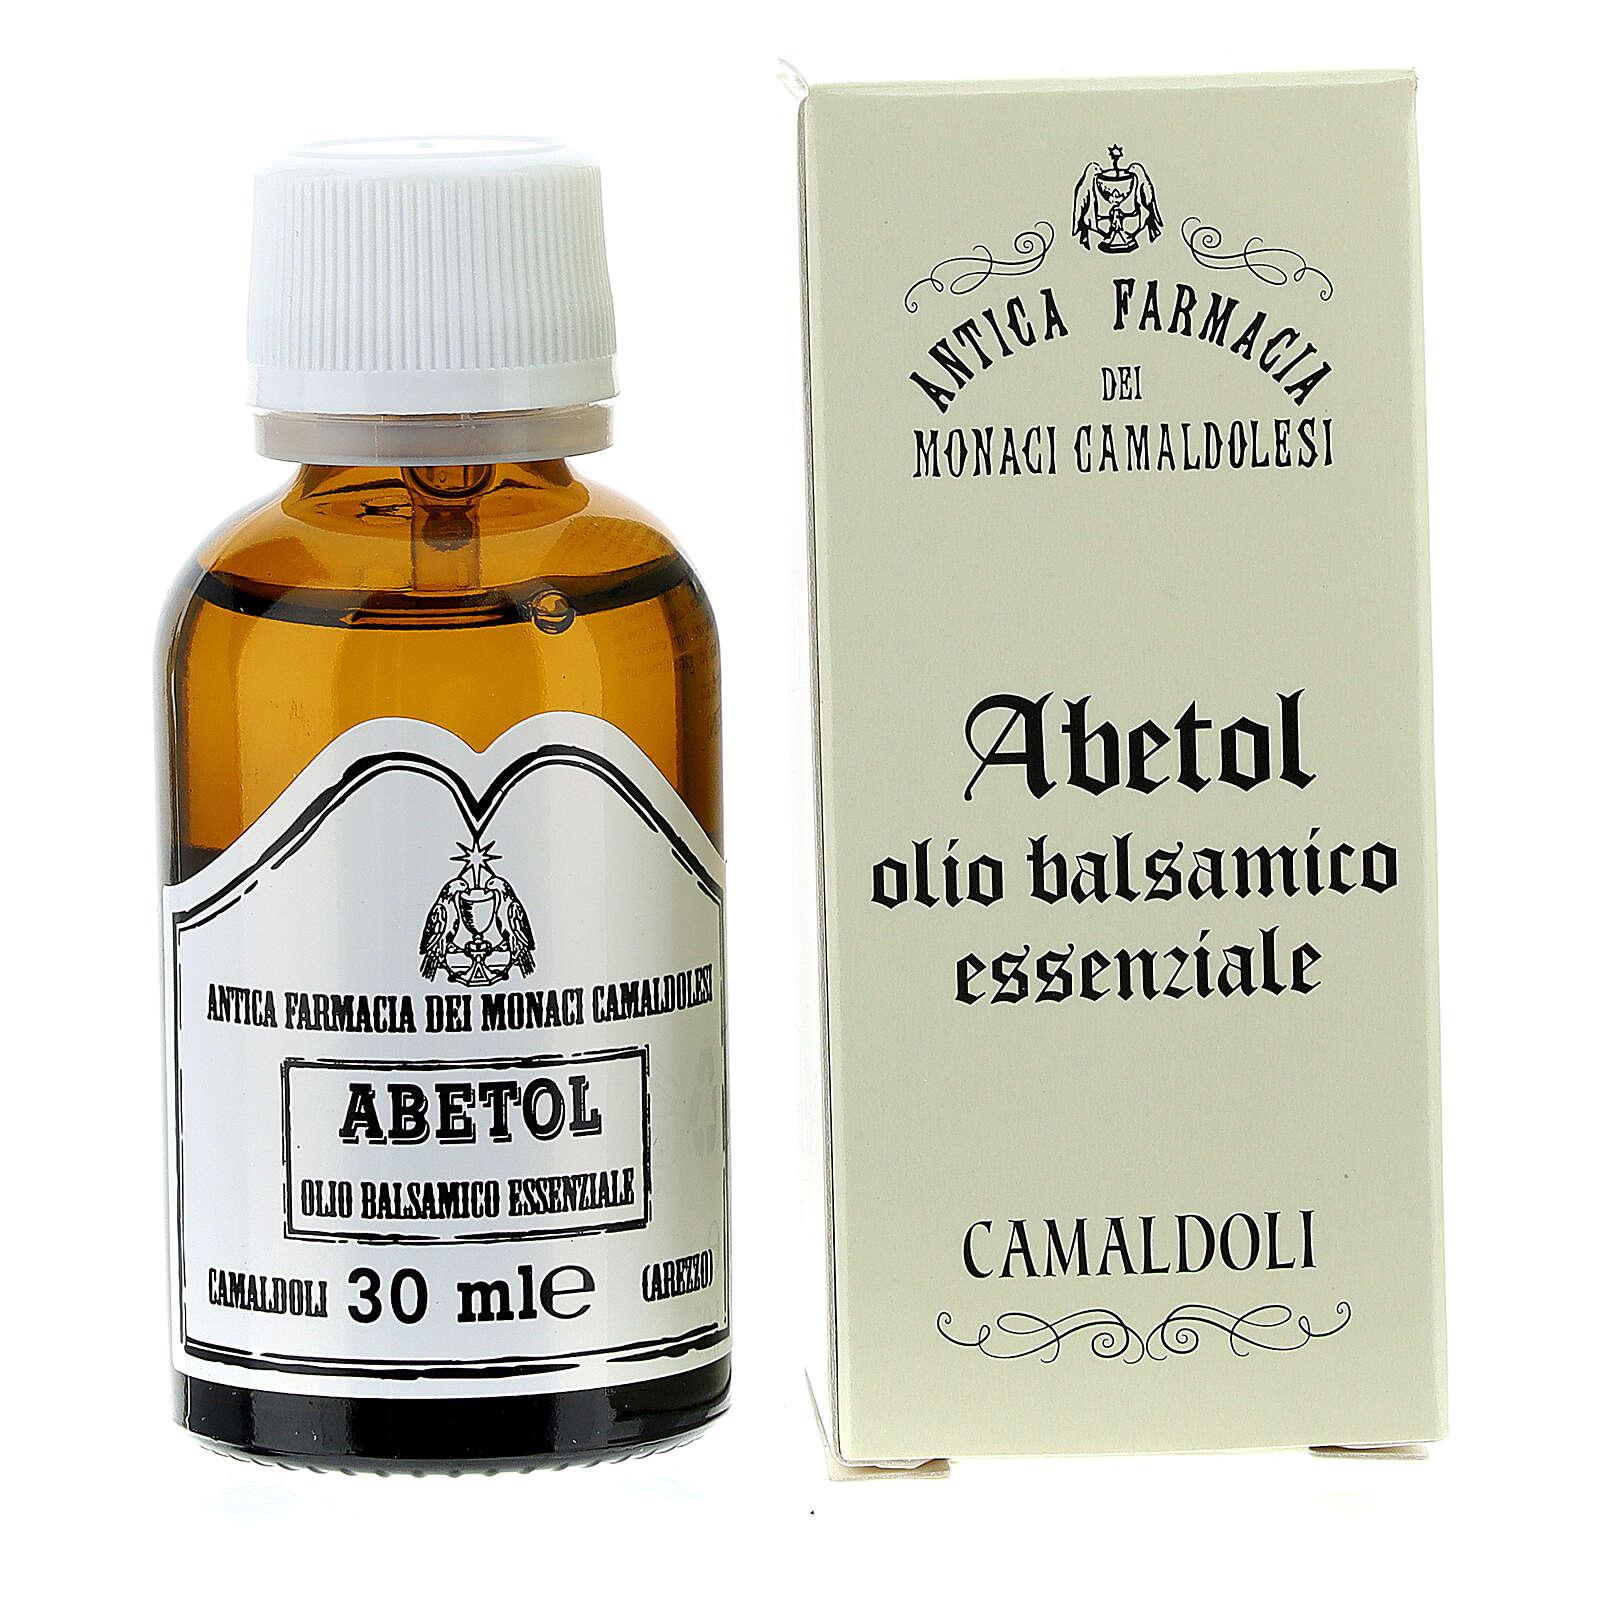 Abetol olejek balsamiczny 30 ml Kameduli 4